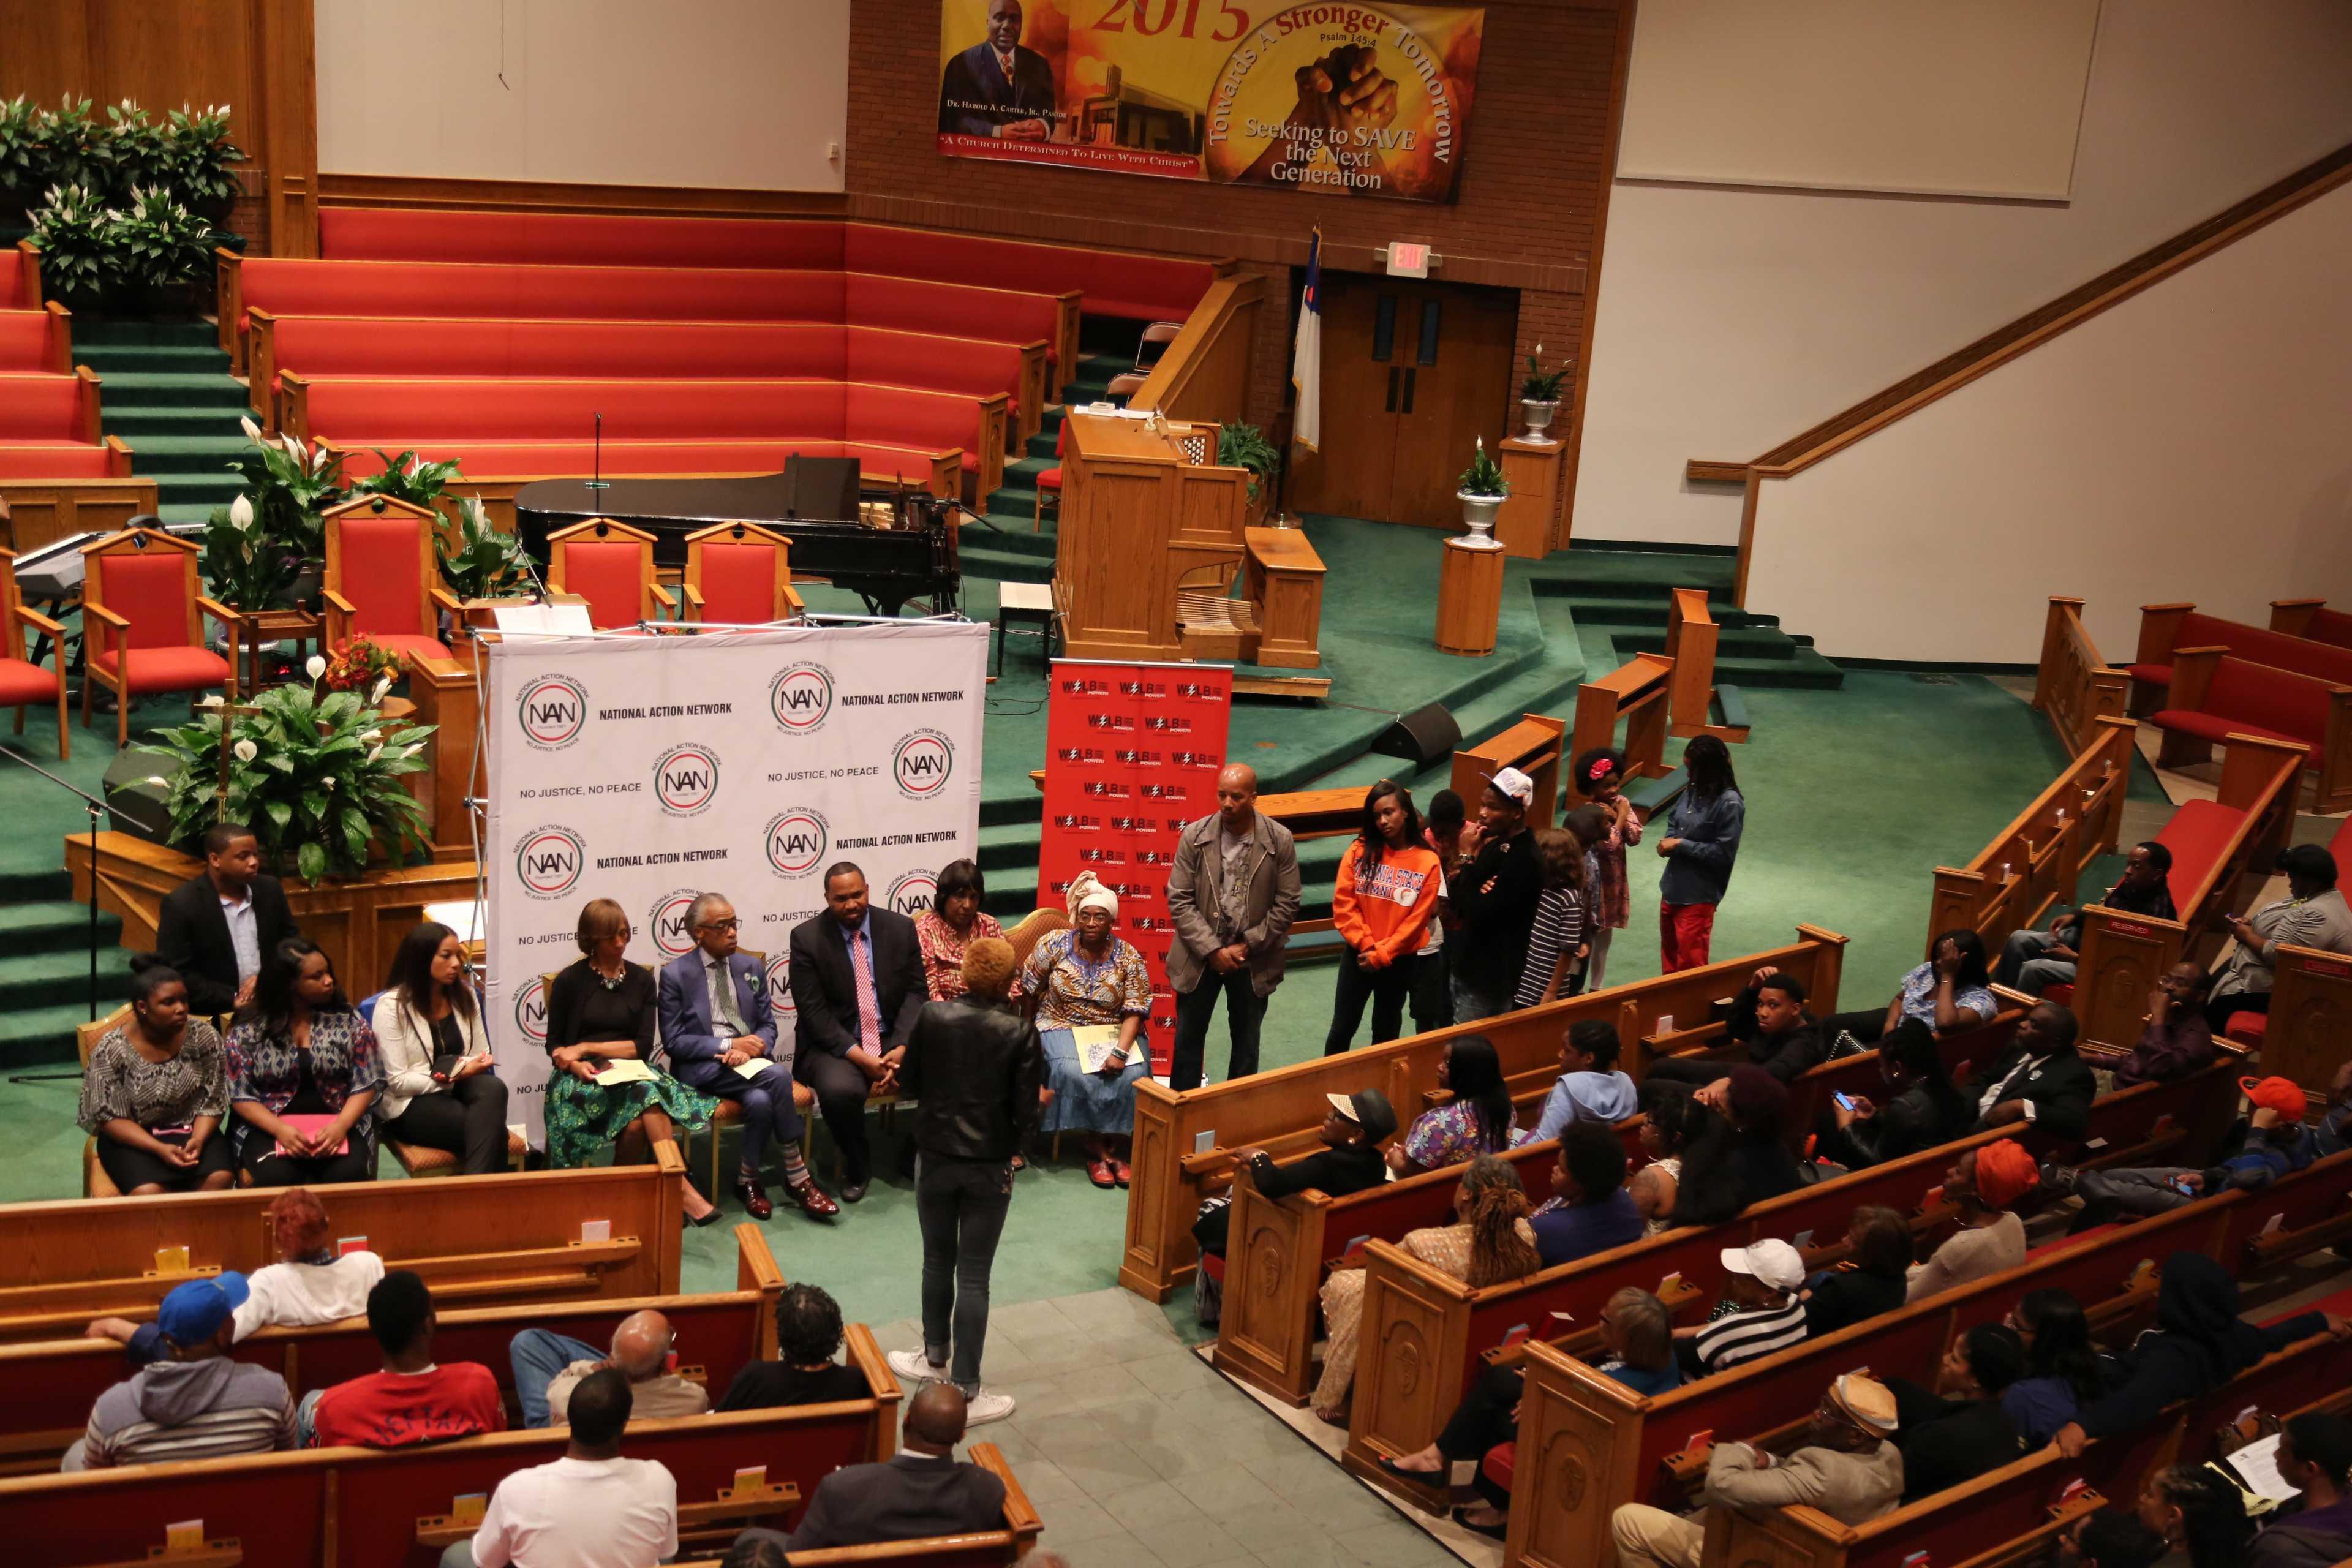 Al Sharpton and panelists at New Shiloh Baptist Church